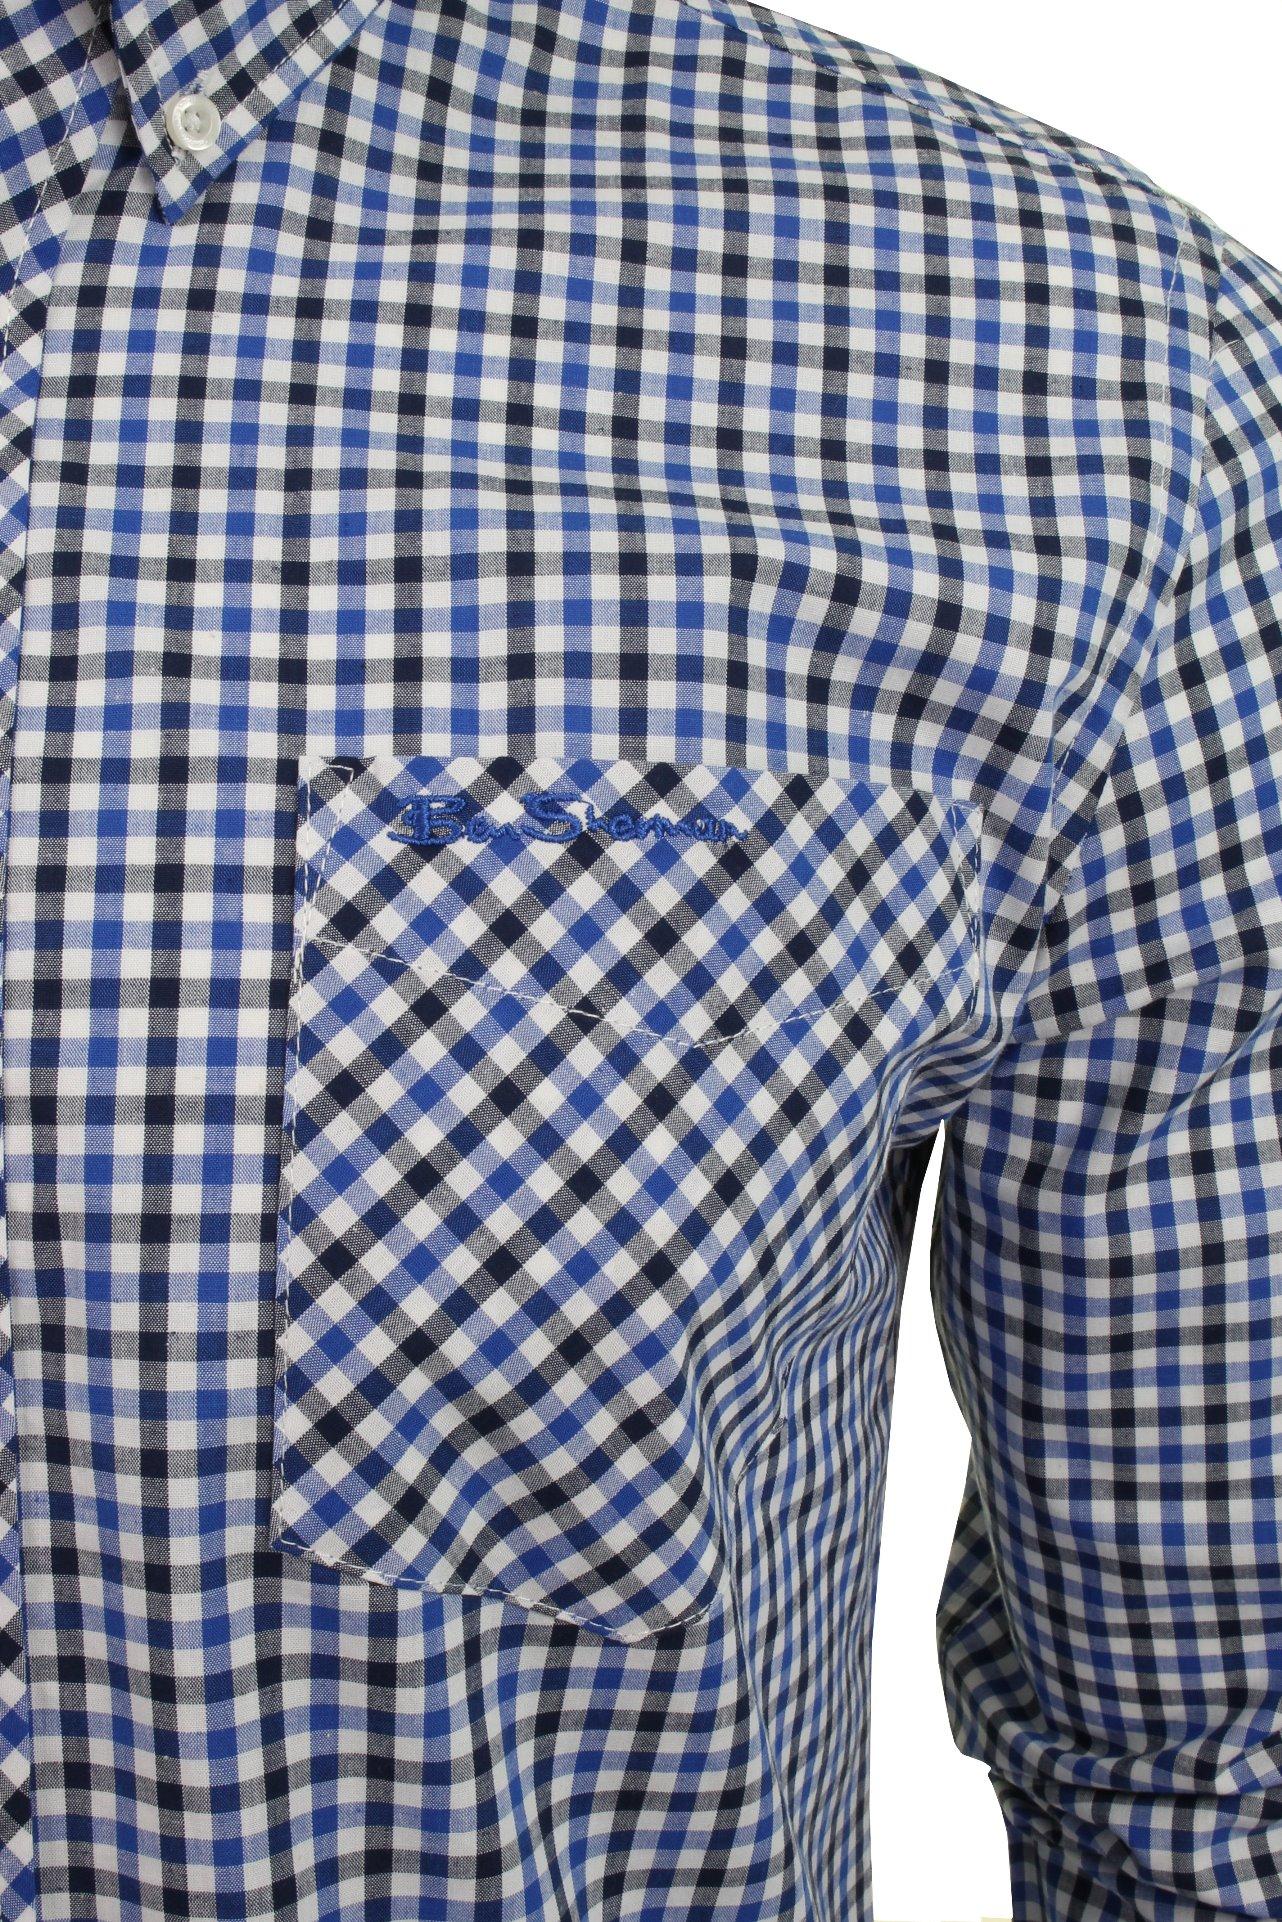 Ben-Sherman-Men-039-s-Long-Sleeved-Gingham-Check-Shirt thumbnail 4